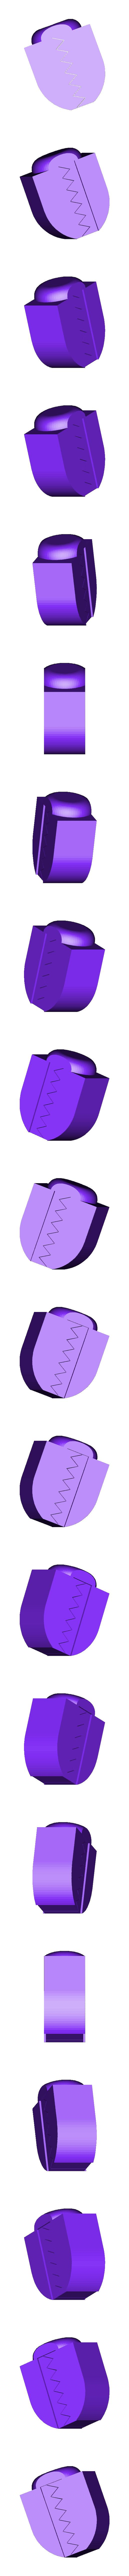 The_Clamp.stl Télécharger fichier STL gratuit Clamps (aka Francis X. Clampazzo) [Futurama] • Plan pour impression 3D, Monomethylhydrazine